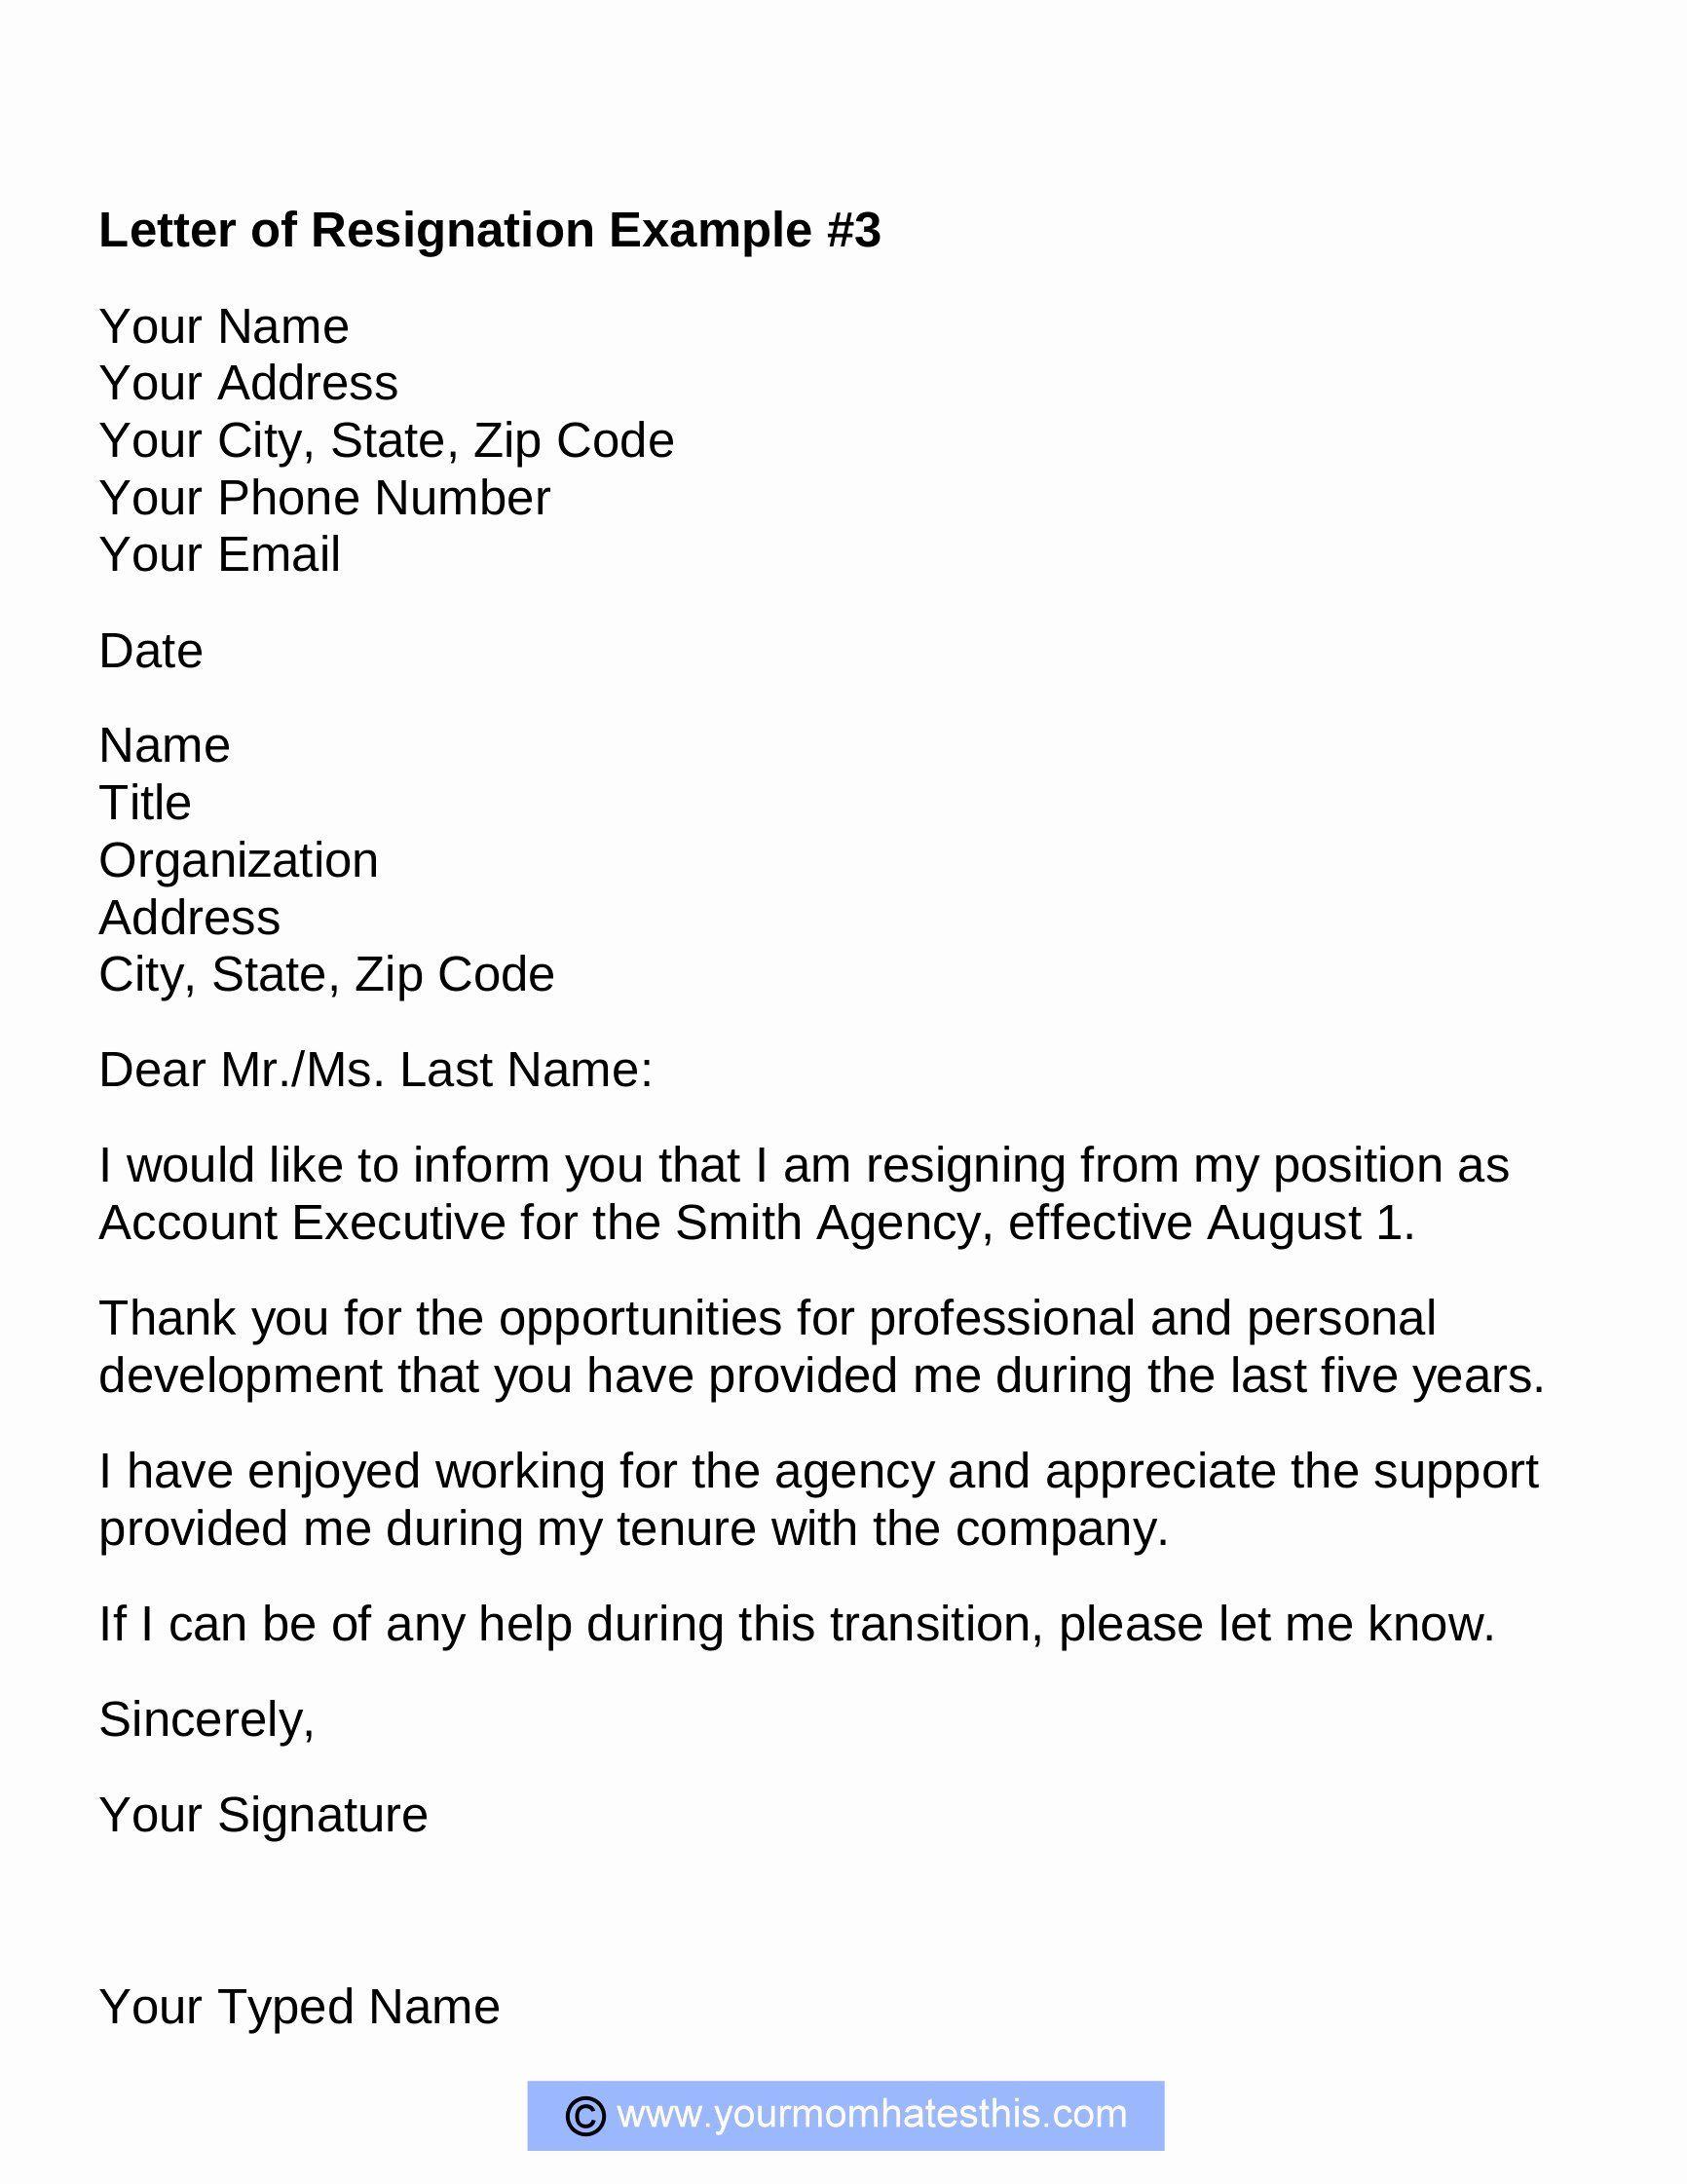 40 Professional Letter Of Resignation Resignation letter